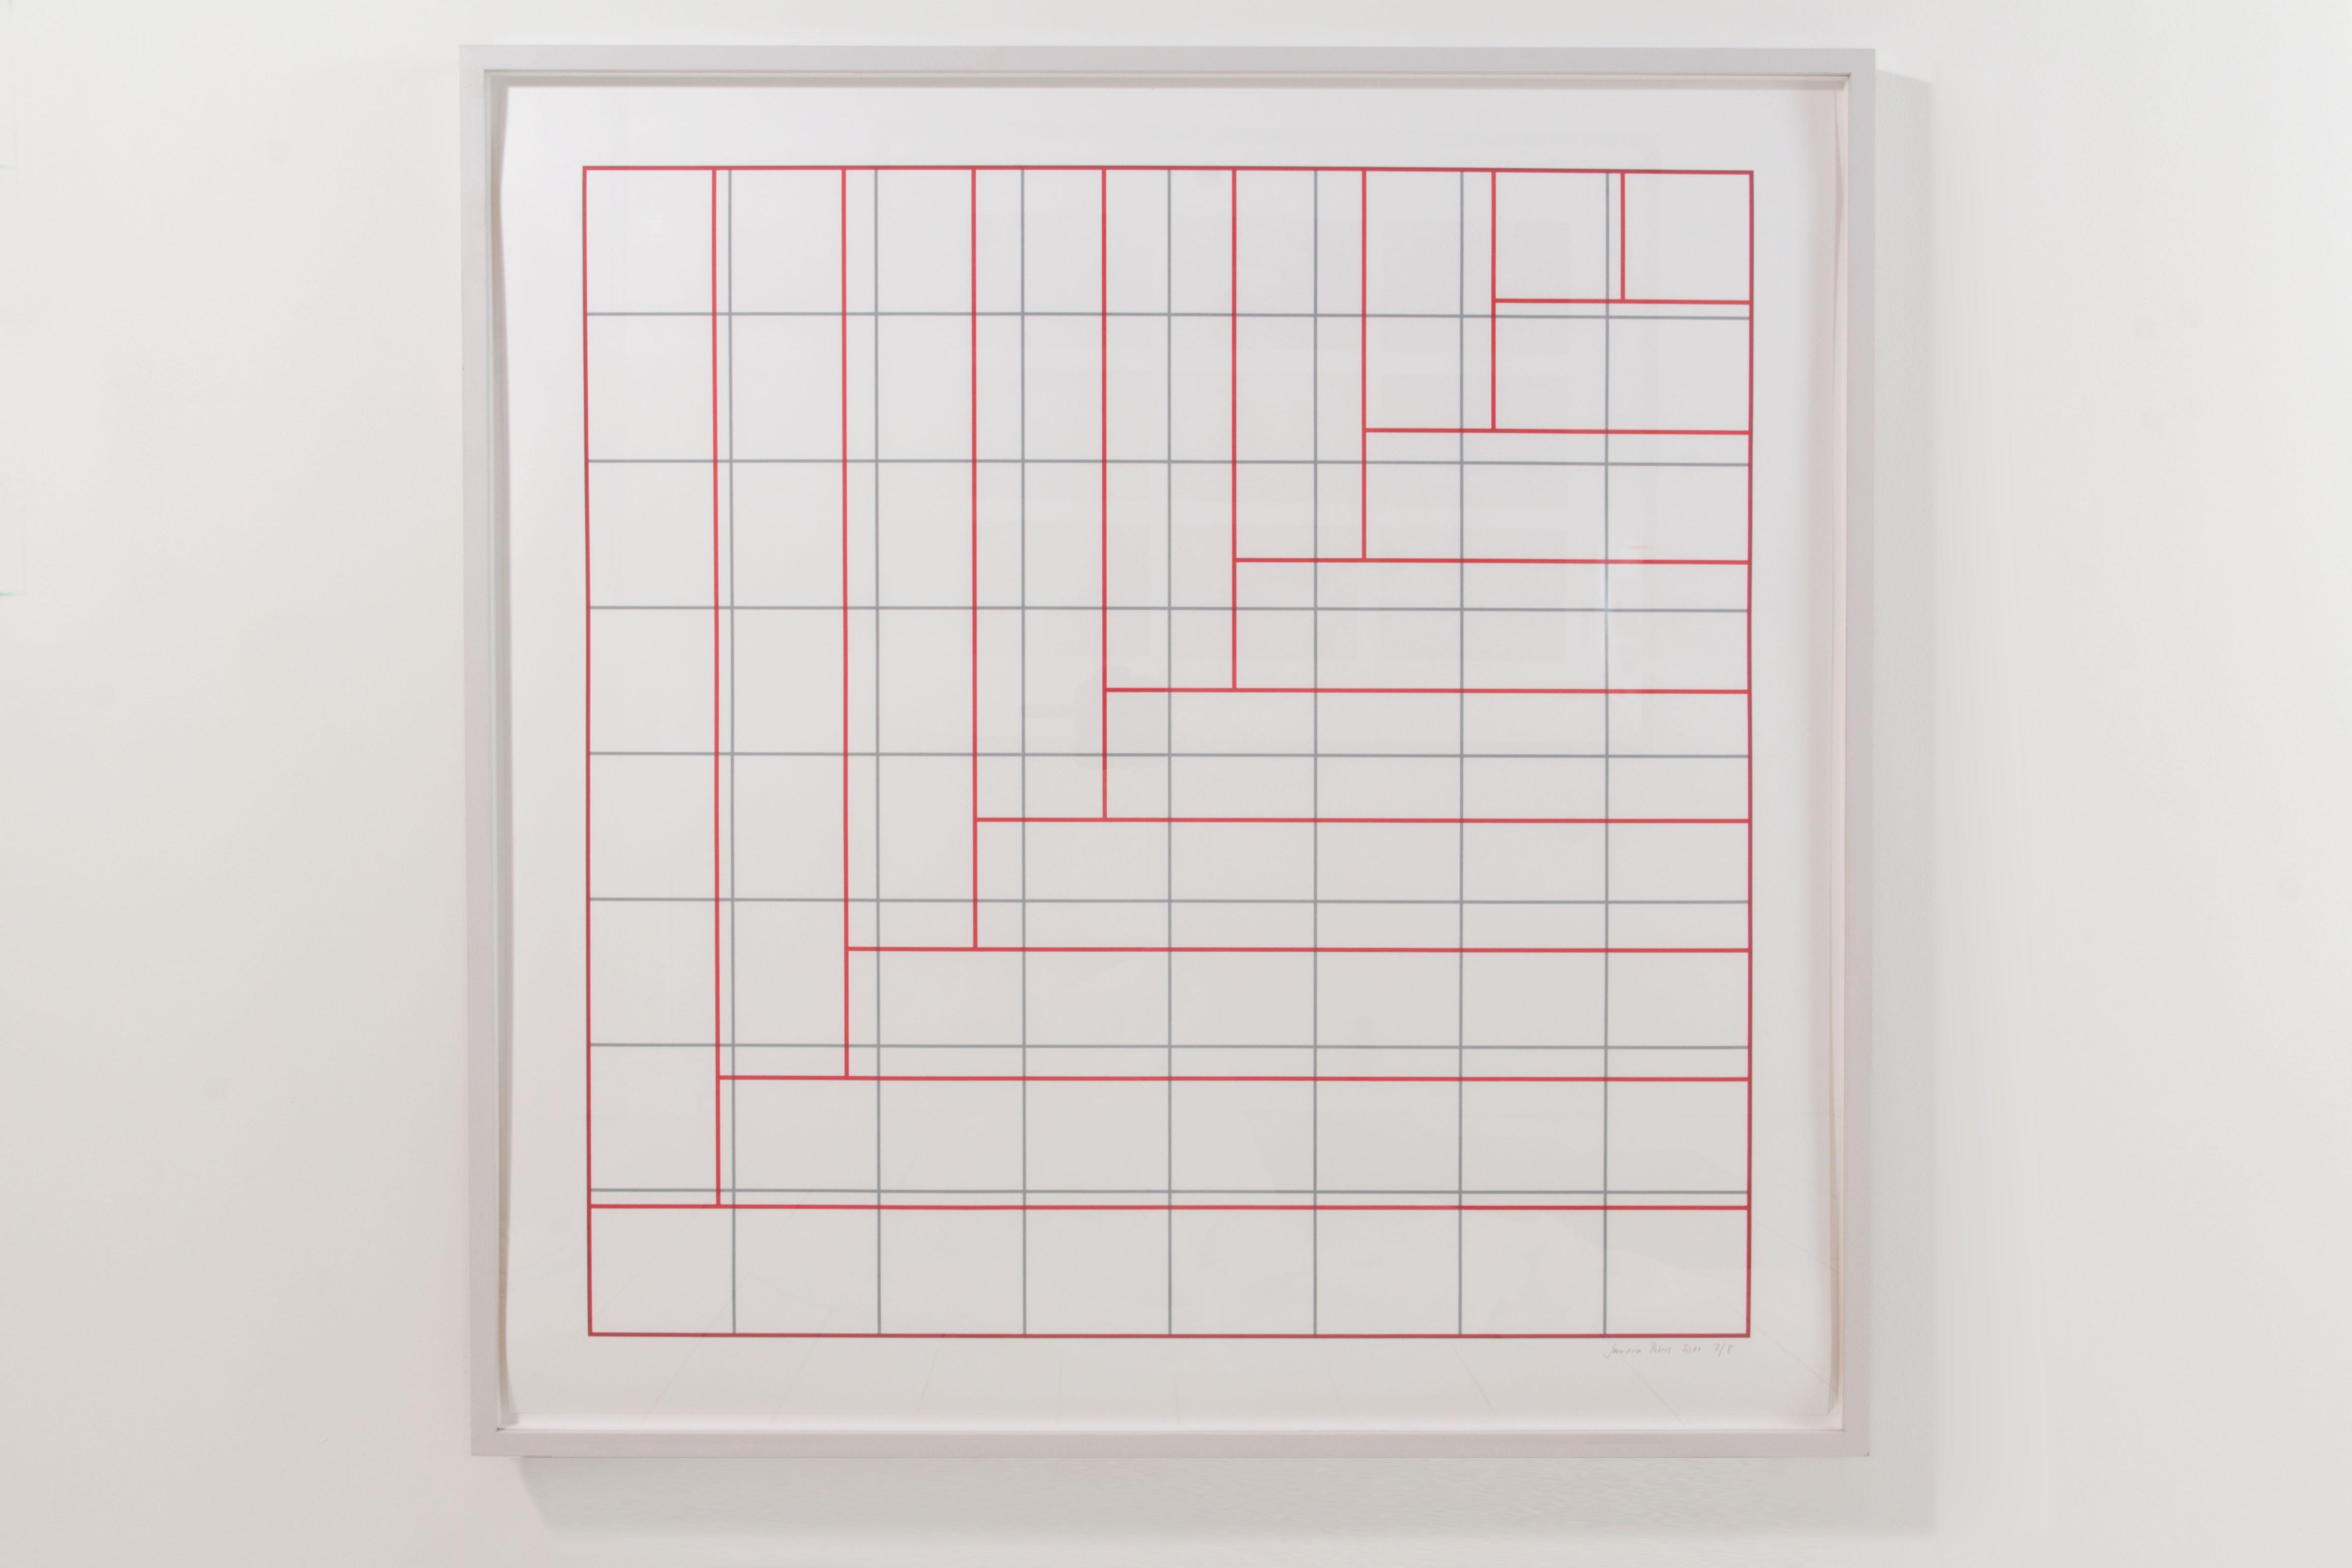 Untitled (Bilateral–Diagonal), 2011 / Multiple Edition of 8 / Photography: Jan Brockhaus